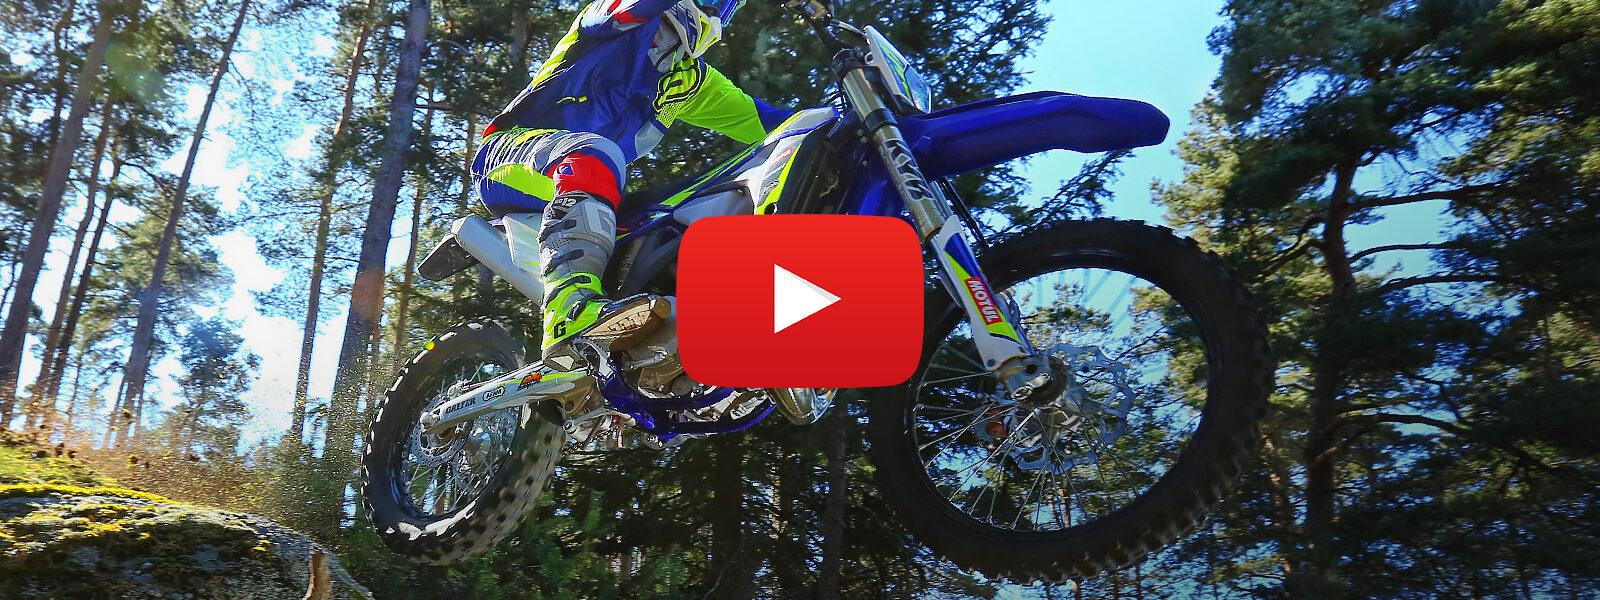 Videón az új ENDURO motorok - SHERCO MY2022